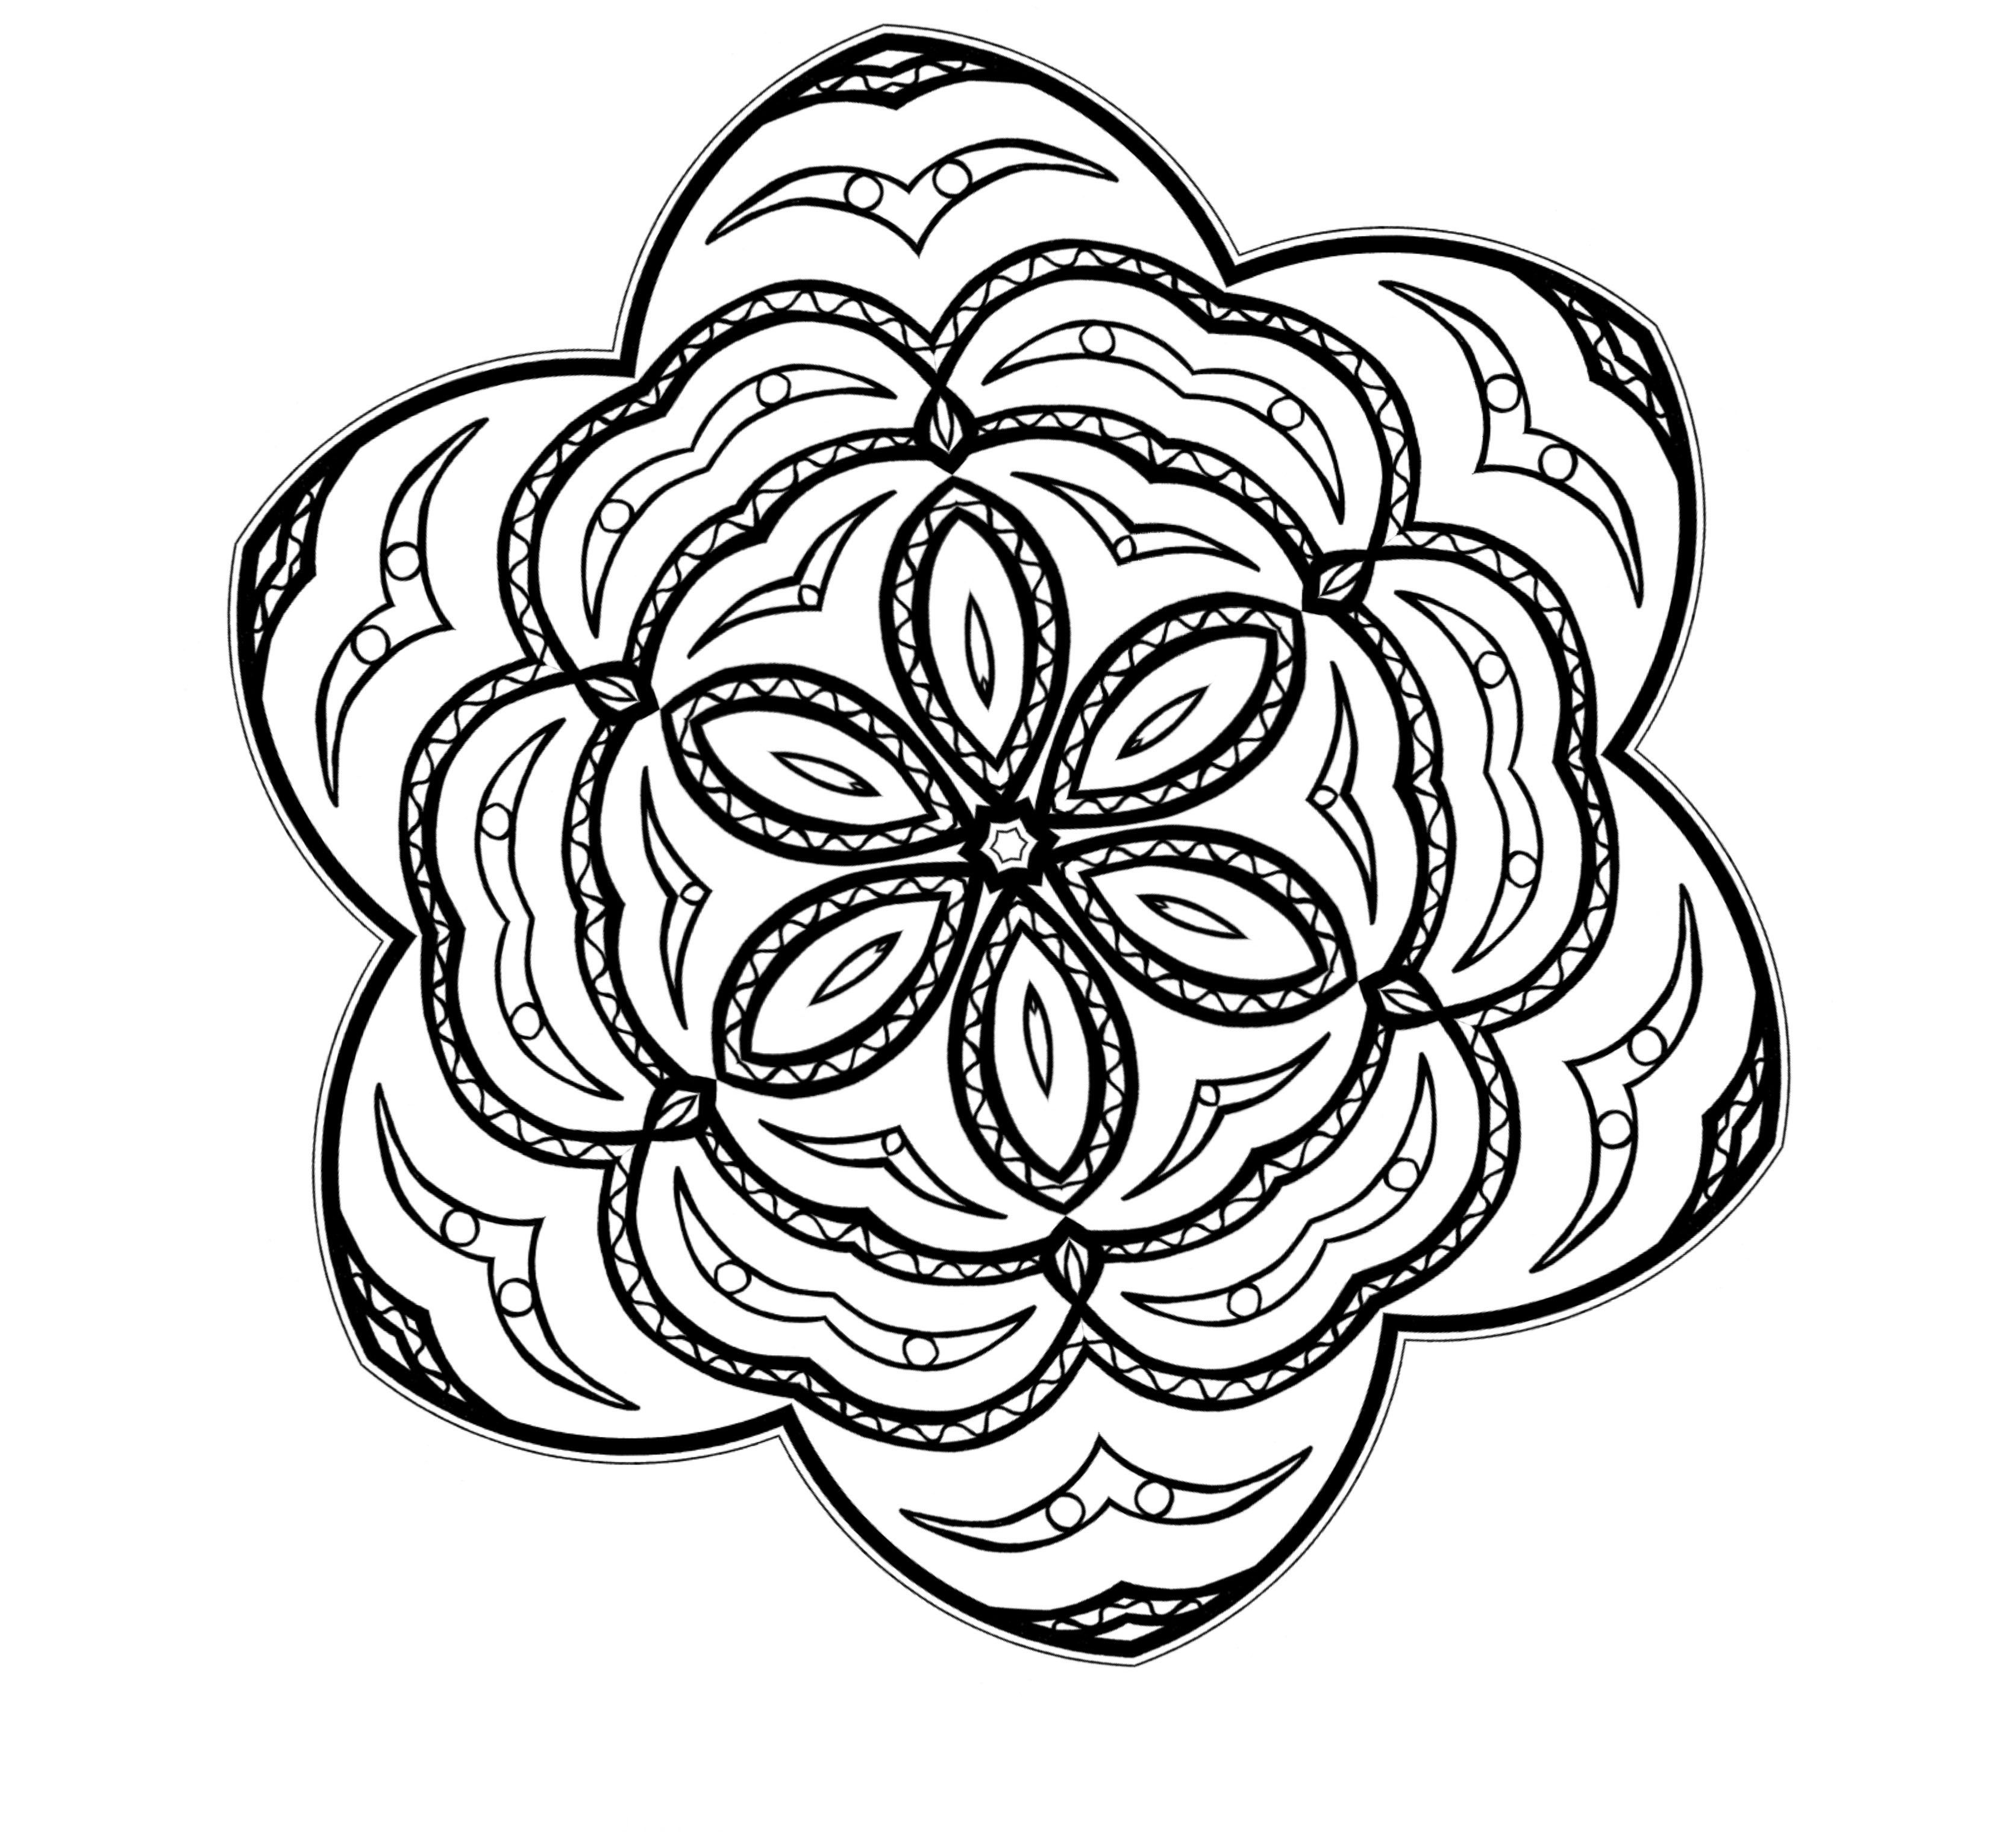 dibujos de mandalas de flores para colorear | MANDALAS | Pinterest ...